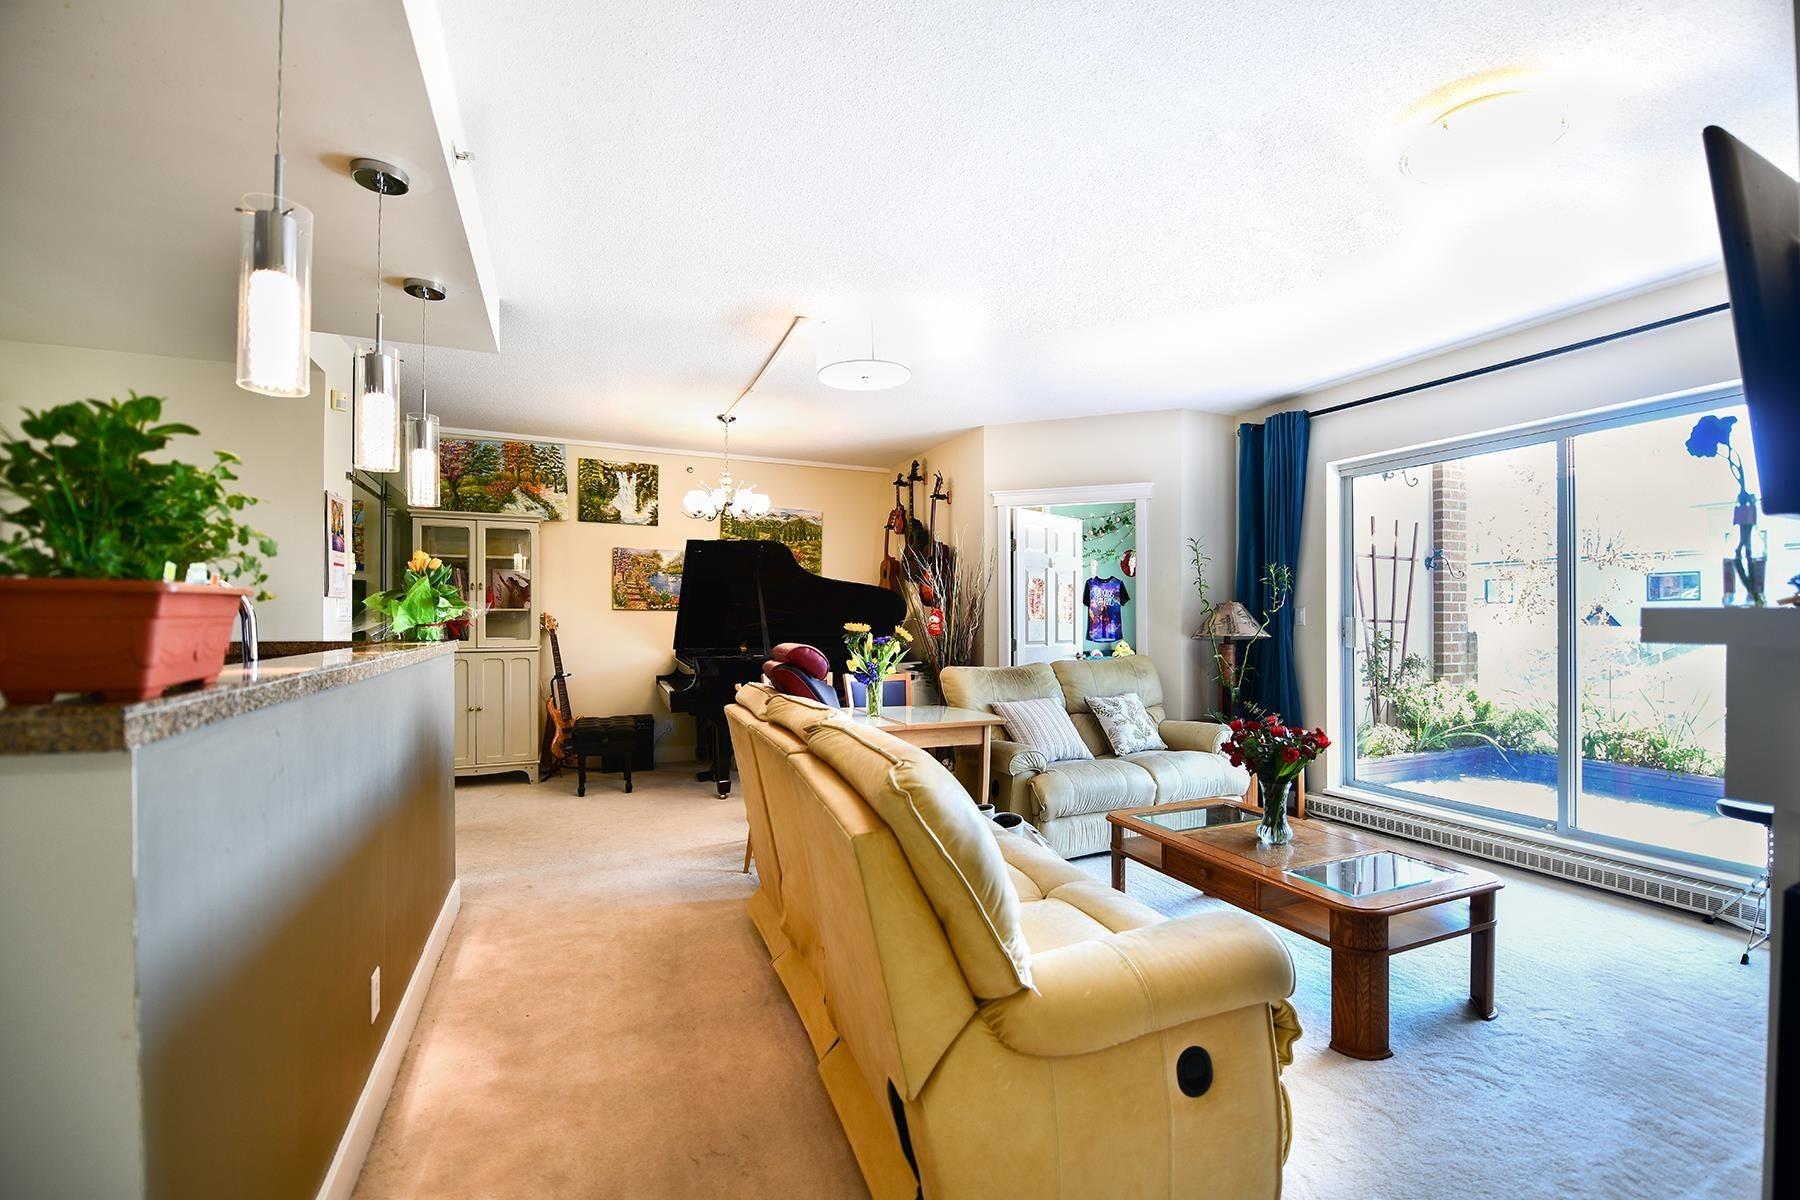 204 5790 EAST BOULEVARD - Kerrisdale Apartment/Condo for sale, 3 Bedrooms (R2604138) - #5